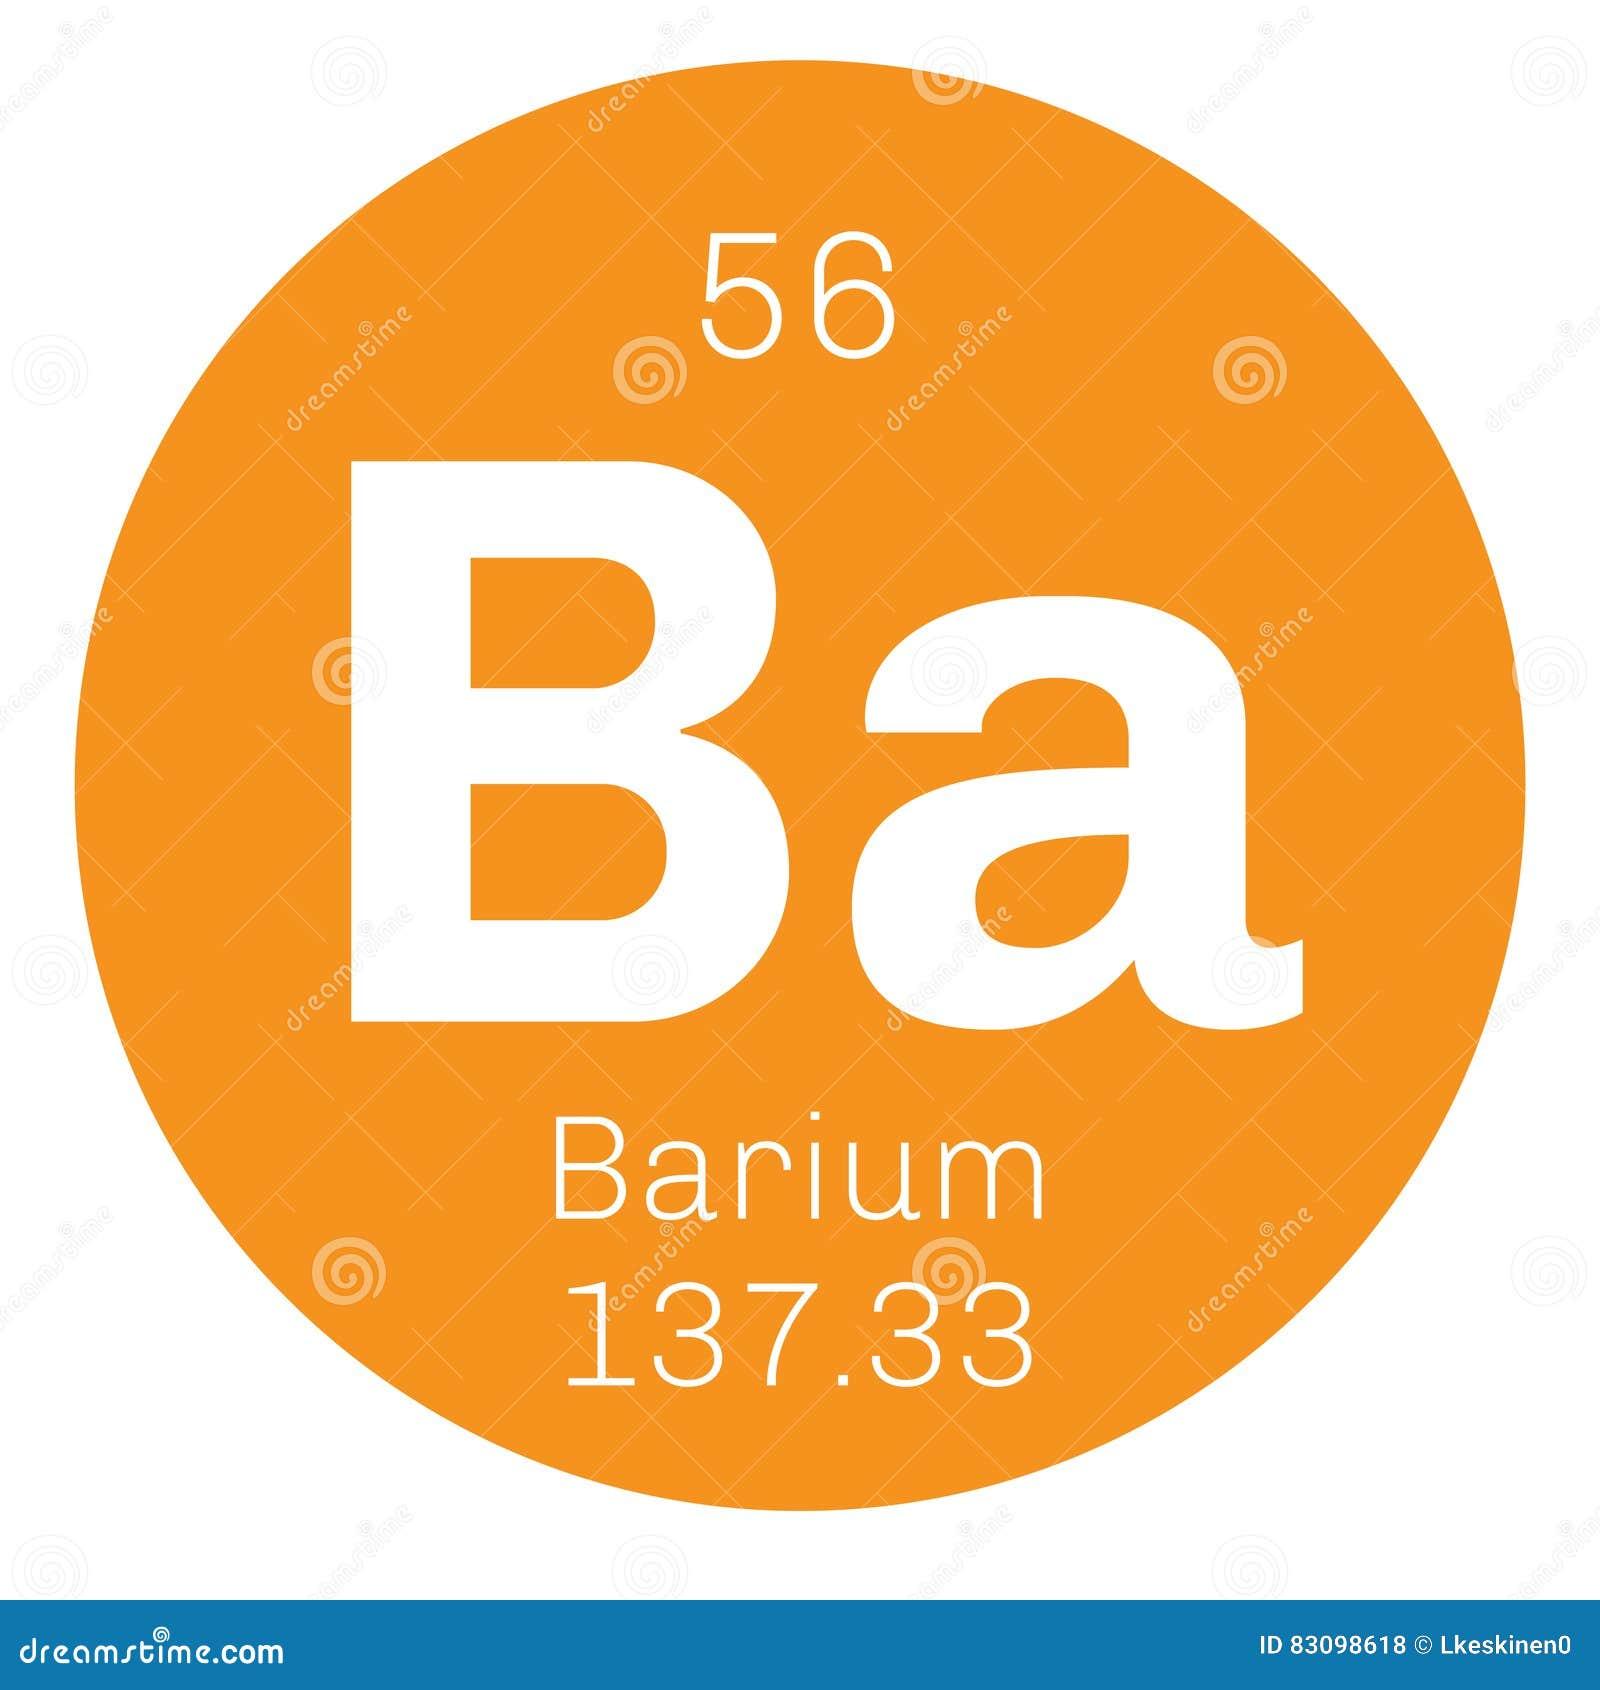 Barium Chemical Element Stock Vector Illustration Of Atomic 83098618